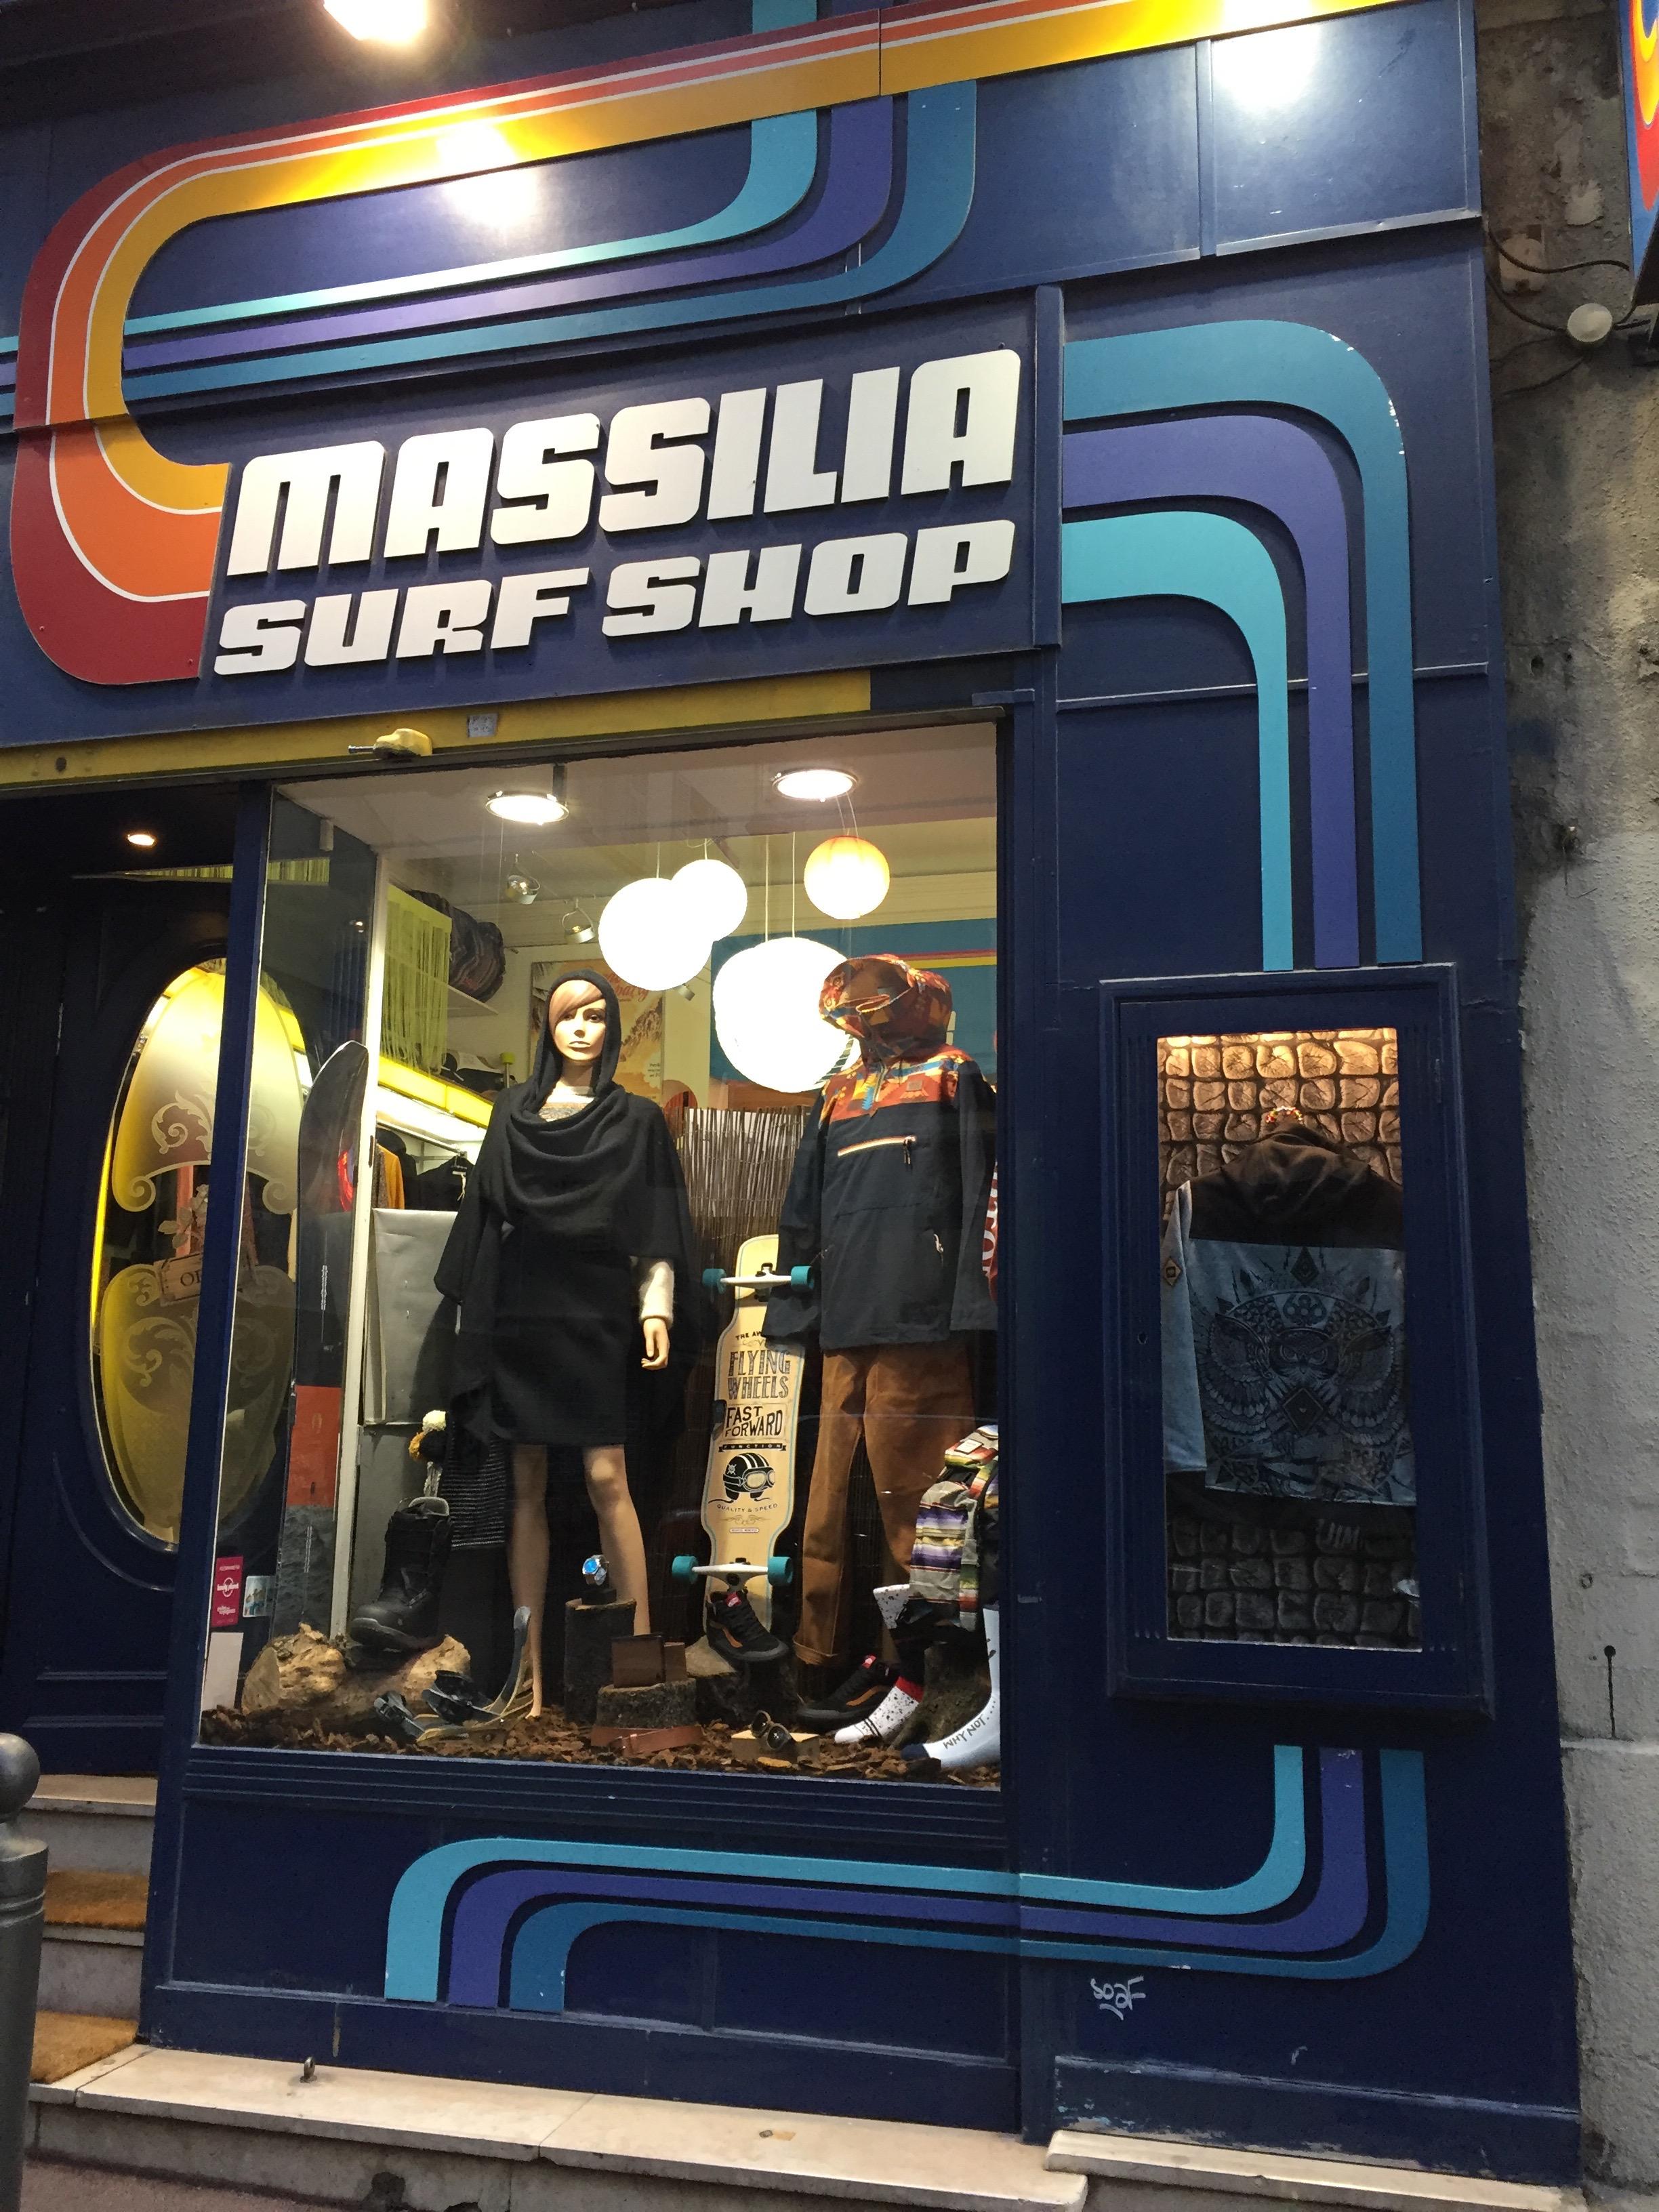 MASSILIA SURF SHOP